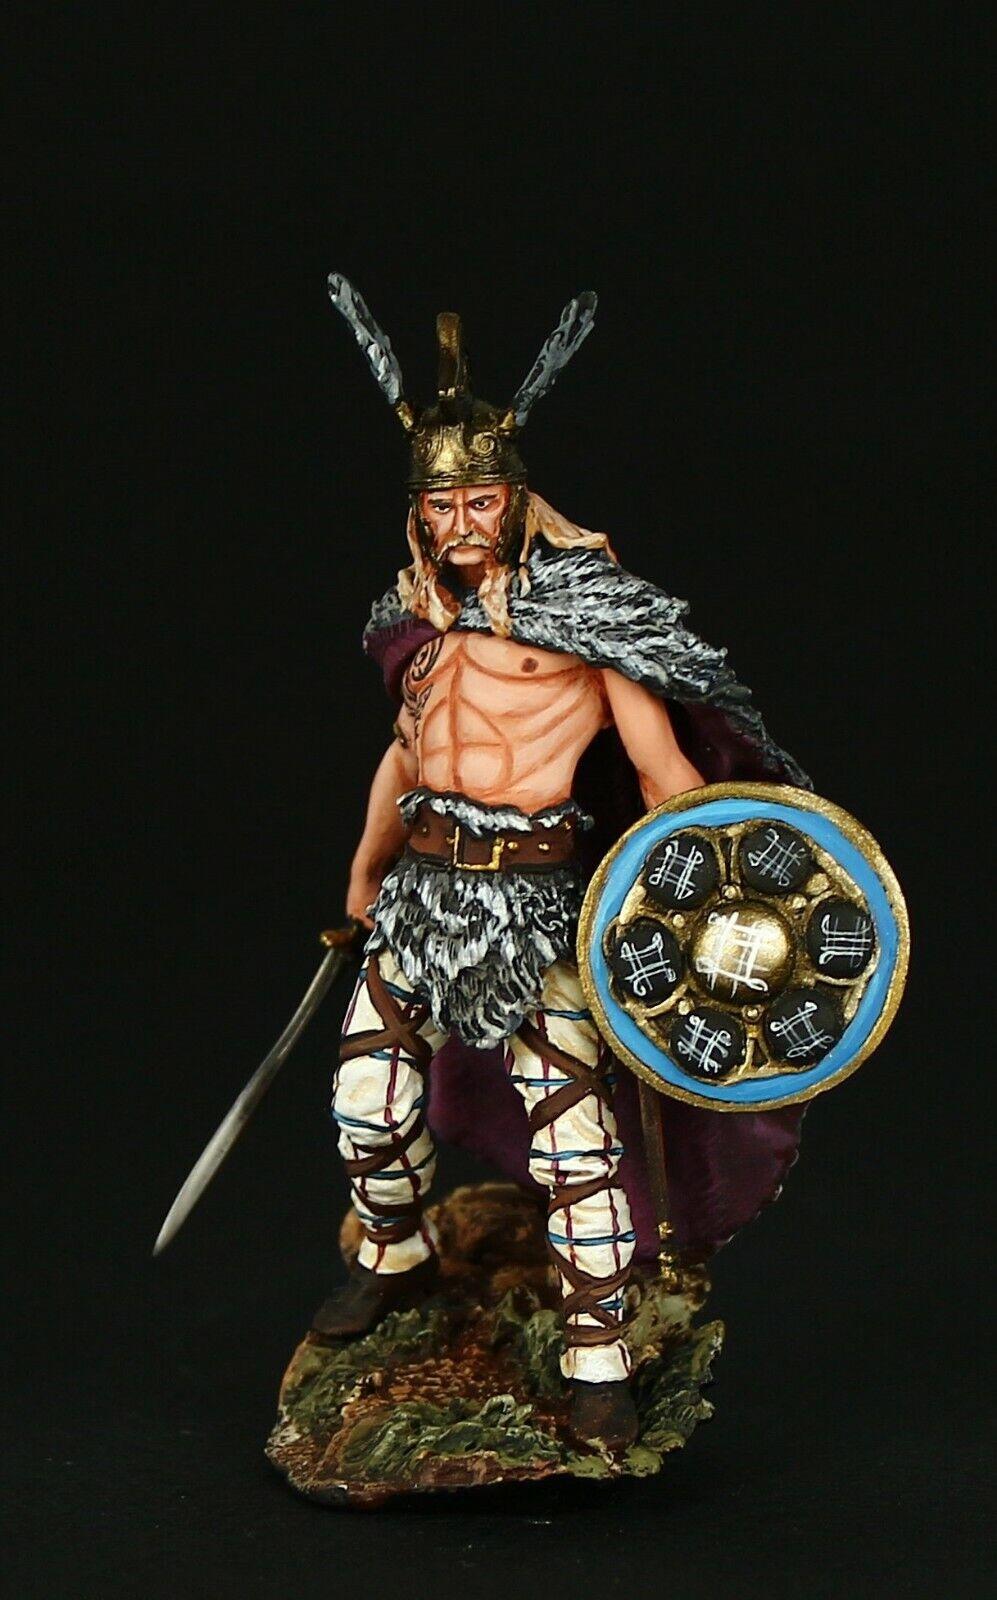 Tin soldier, Vercingetorix, 52 B.C., 54 mm, Barbarians